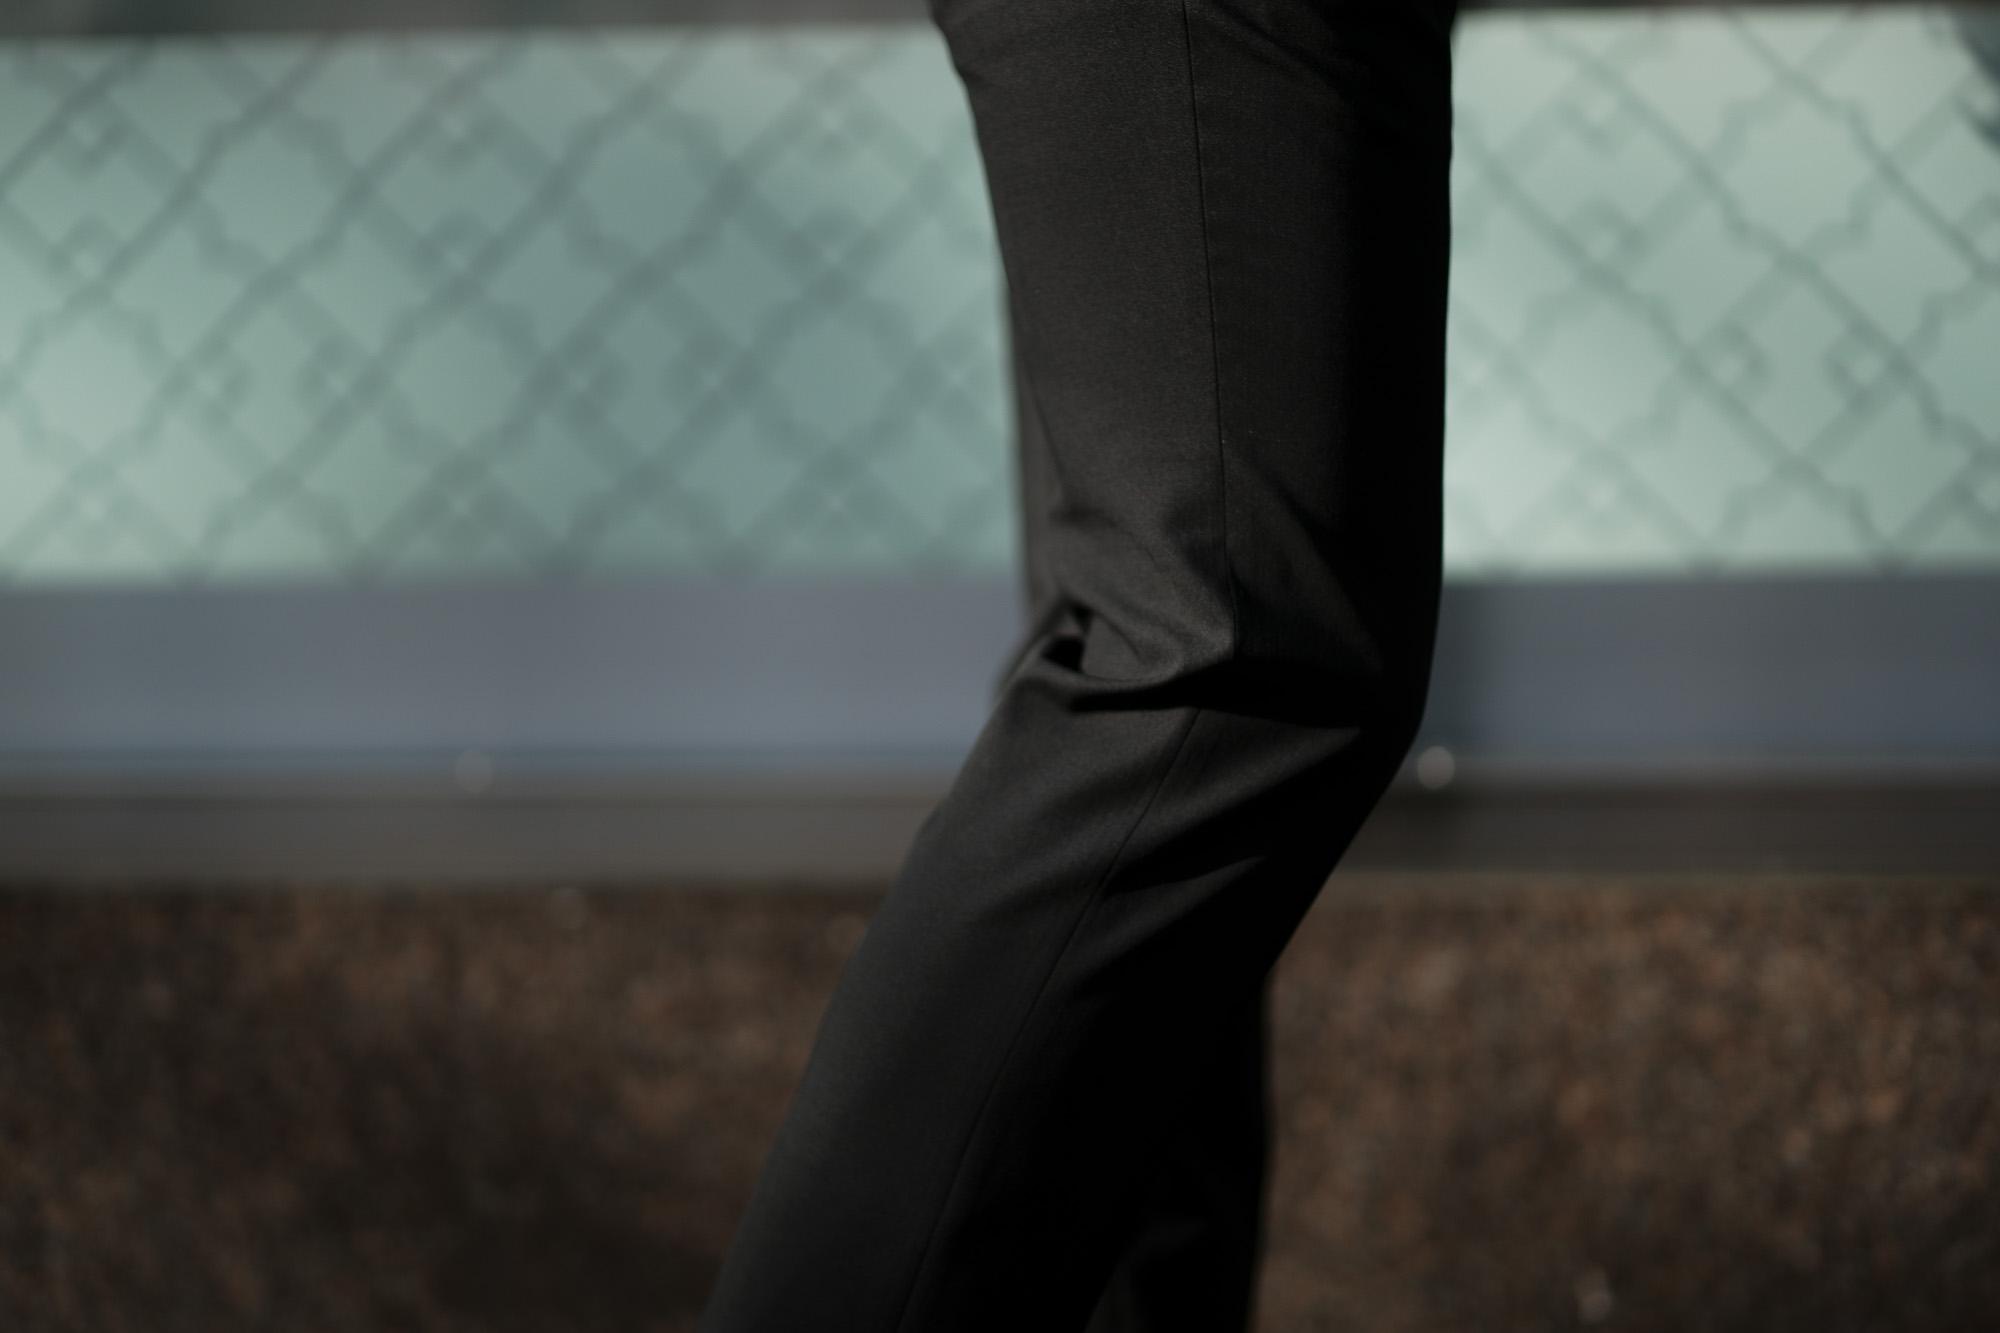 INCOTEX (インコテックス) N35 SLIM FIT (1NT035) URBAN TRAVELER (アーバントラベラー) TROPICAL TECHNOWOOL 撥水 ウォッシャブル トロピカル サマーウール スラックス BLACK (ブラック・990) 2020 春夏 【ご予約受付中】愛知 名古屋 altoediritto アルトエデリット